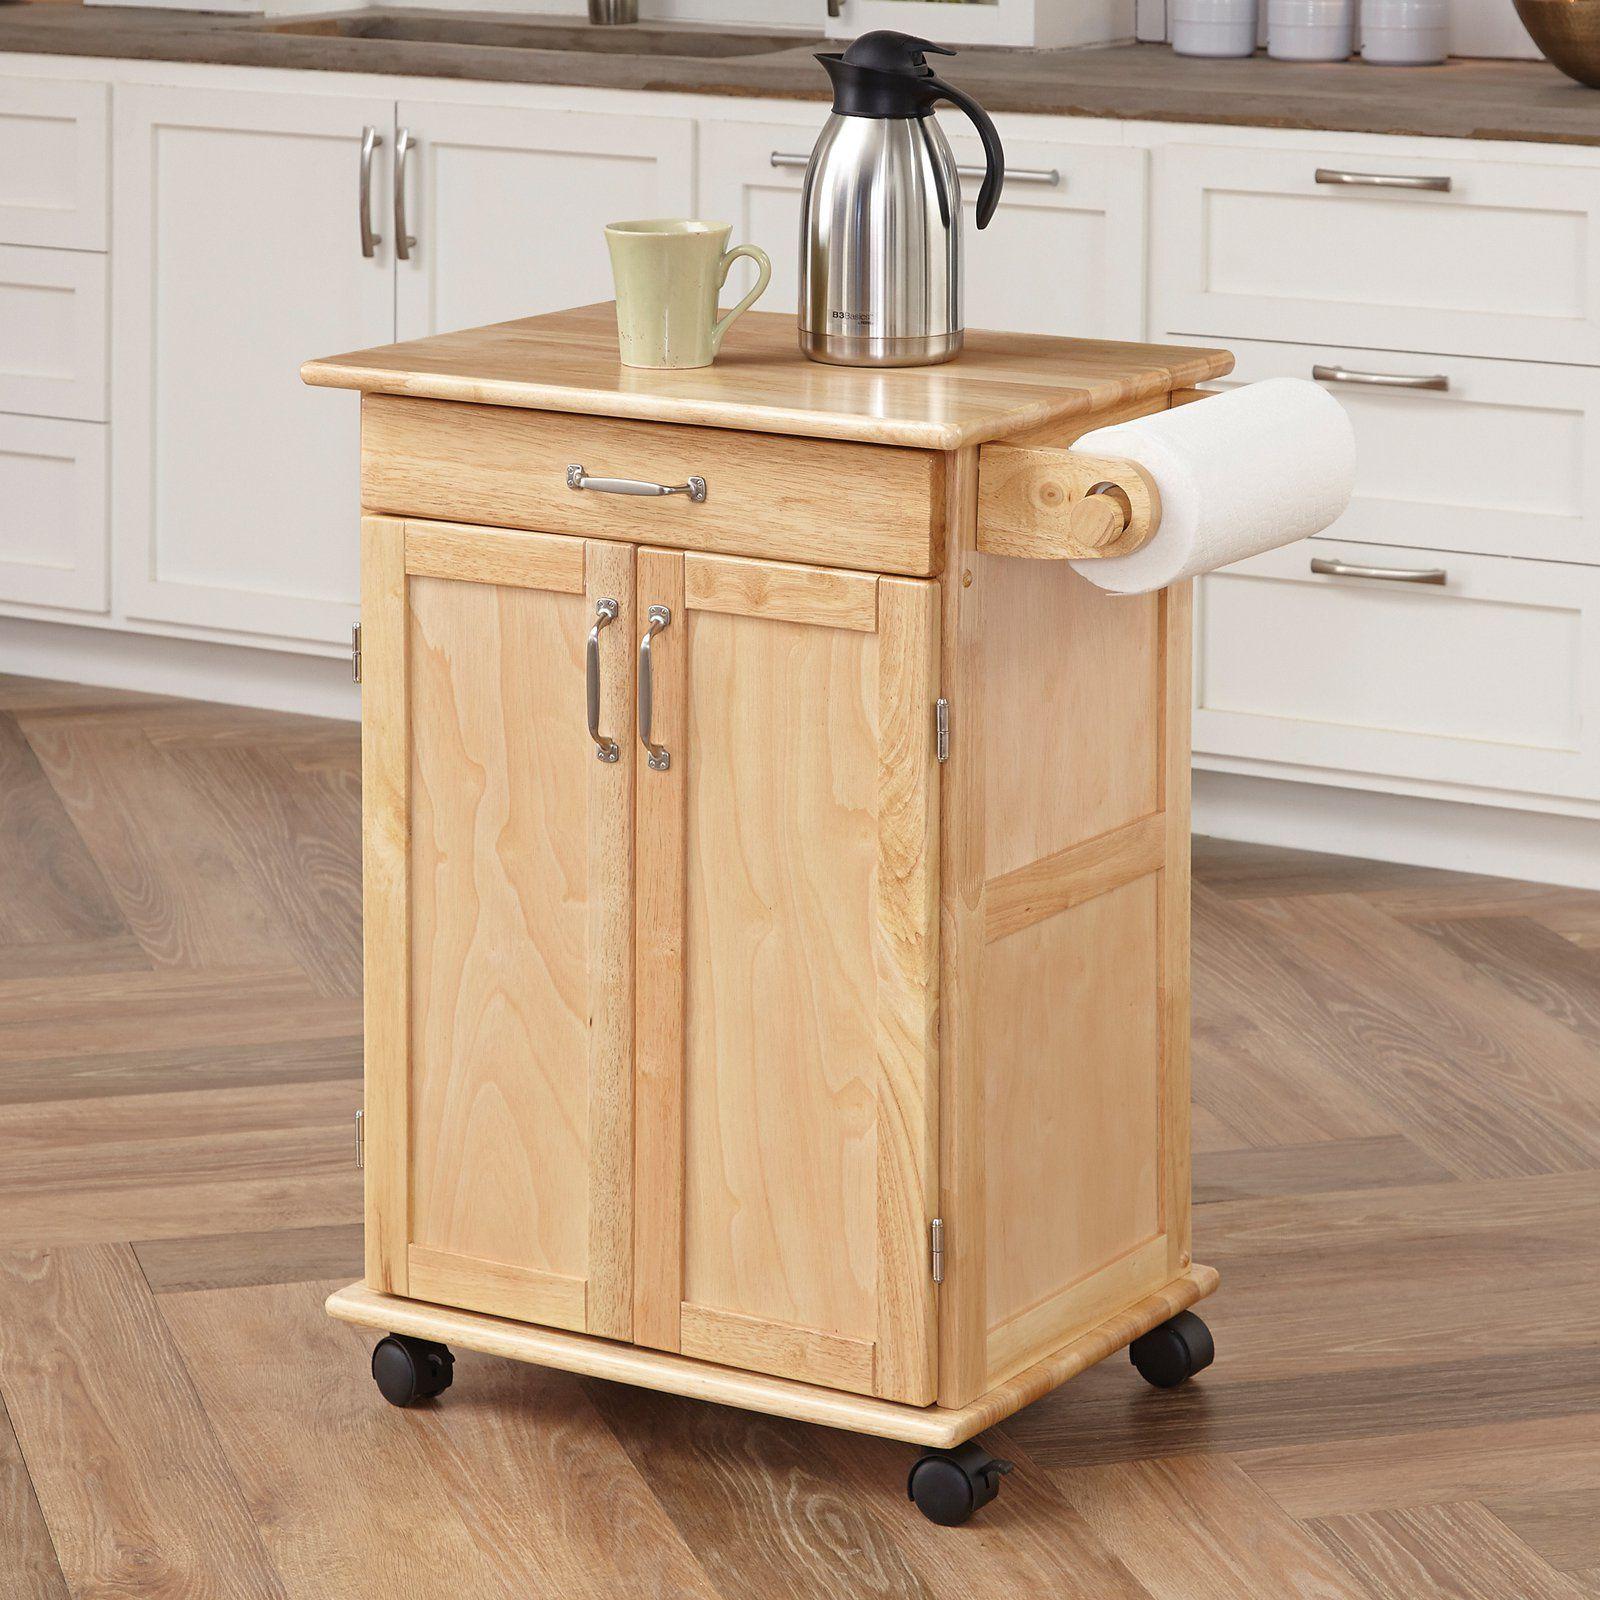 Styles Dainty Wood Kitchen Cart - 5040-95